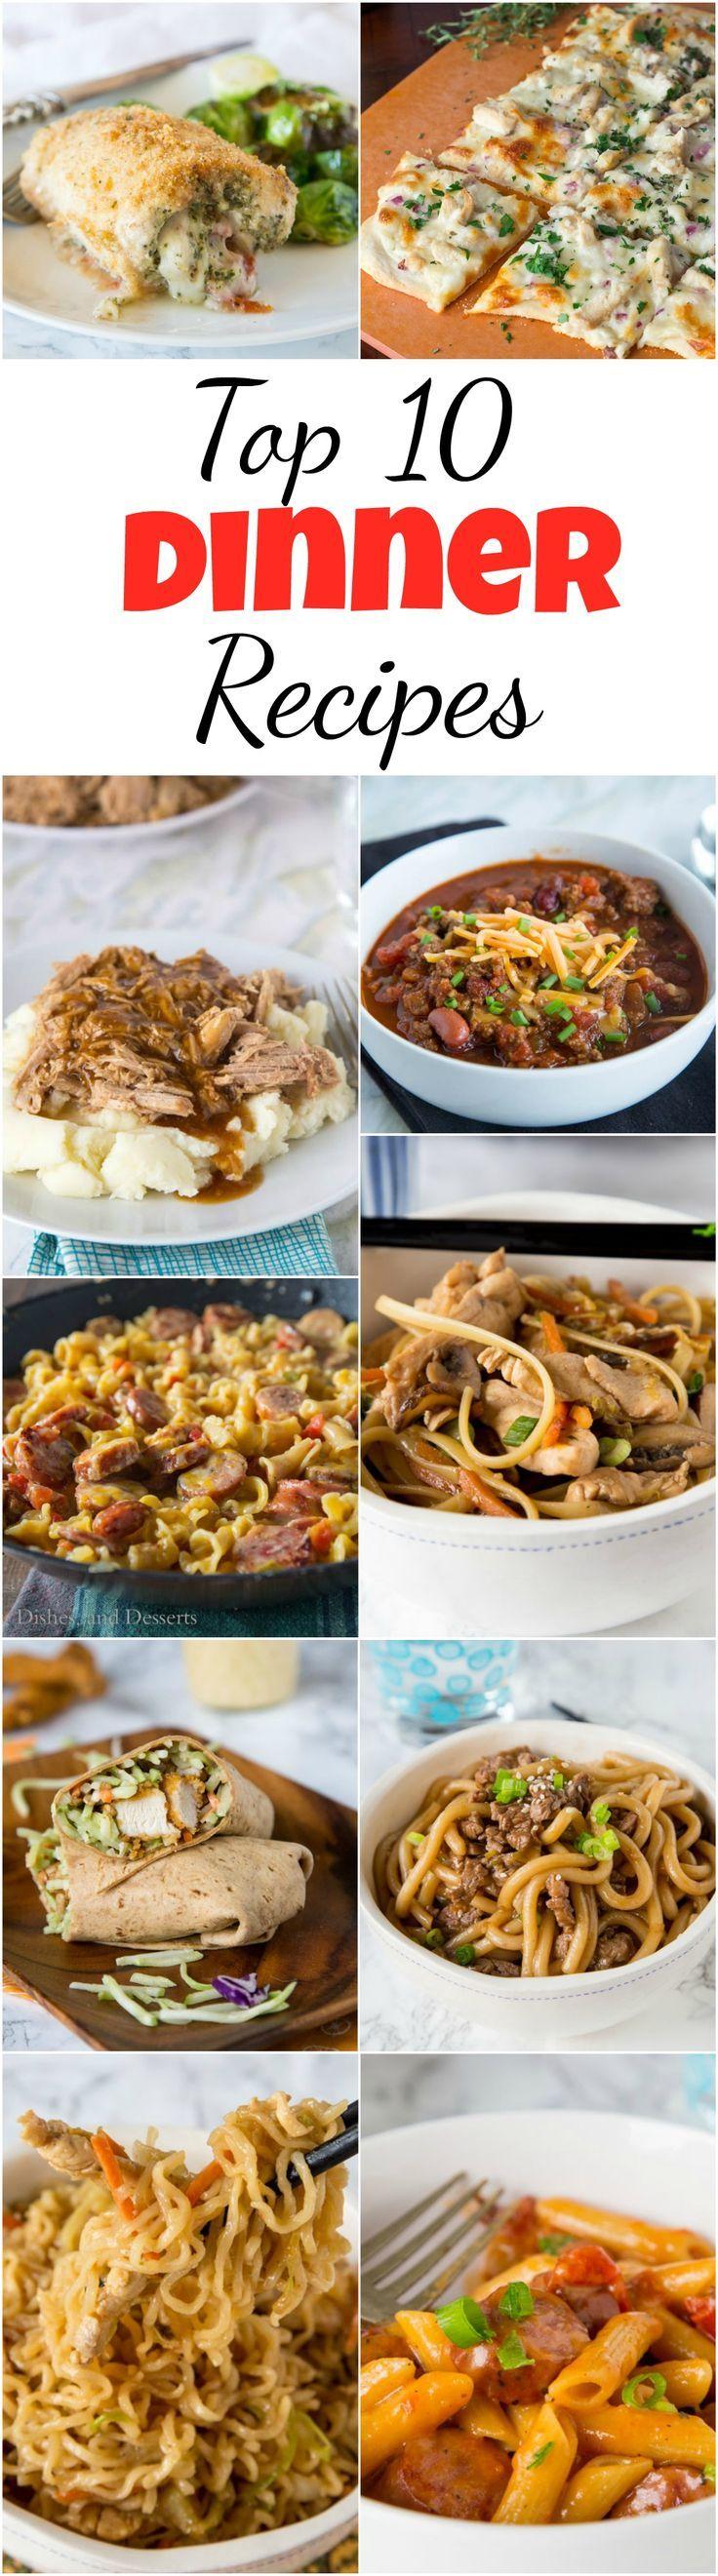 Top 10 Dinner Recipes